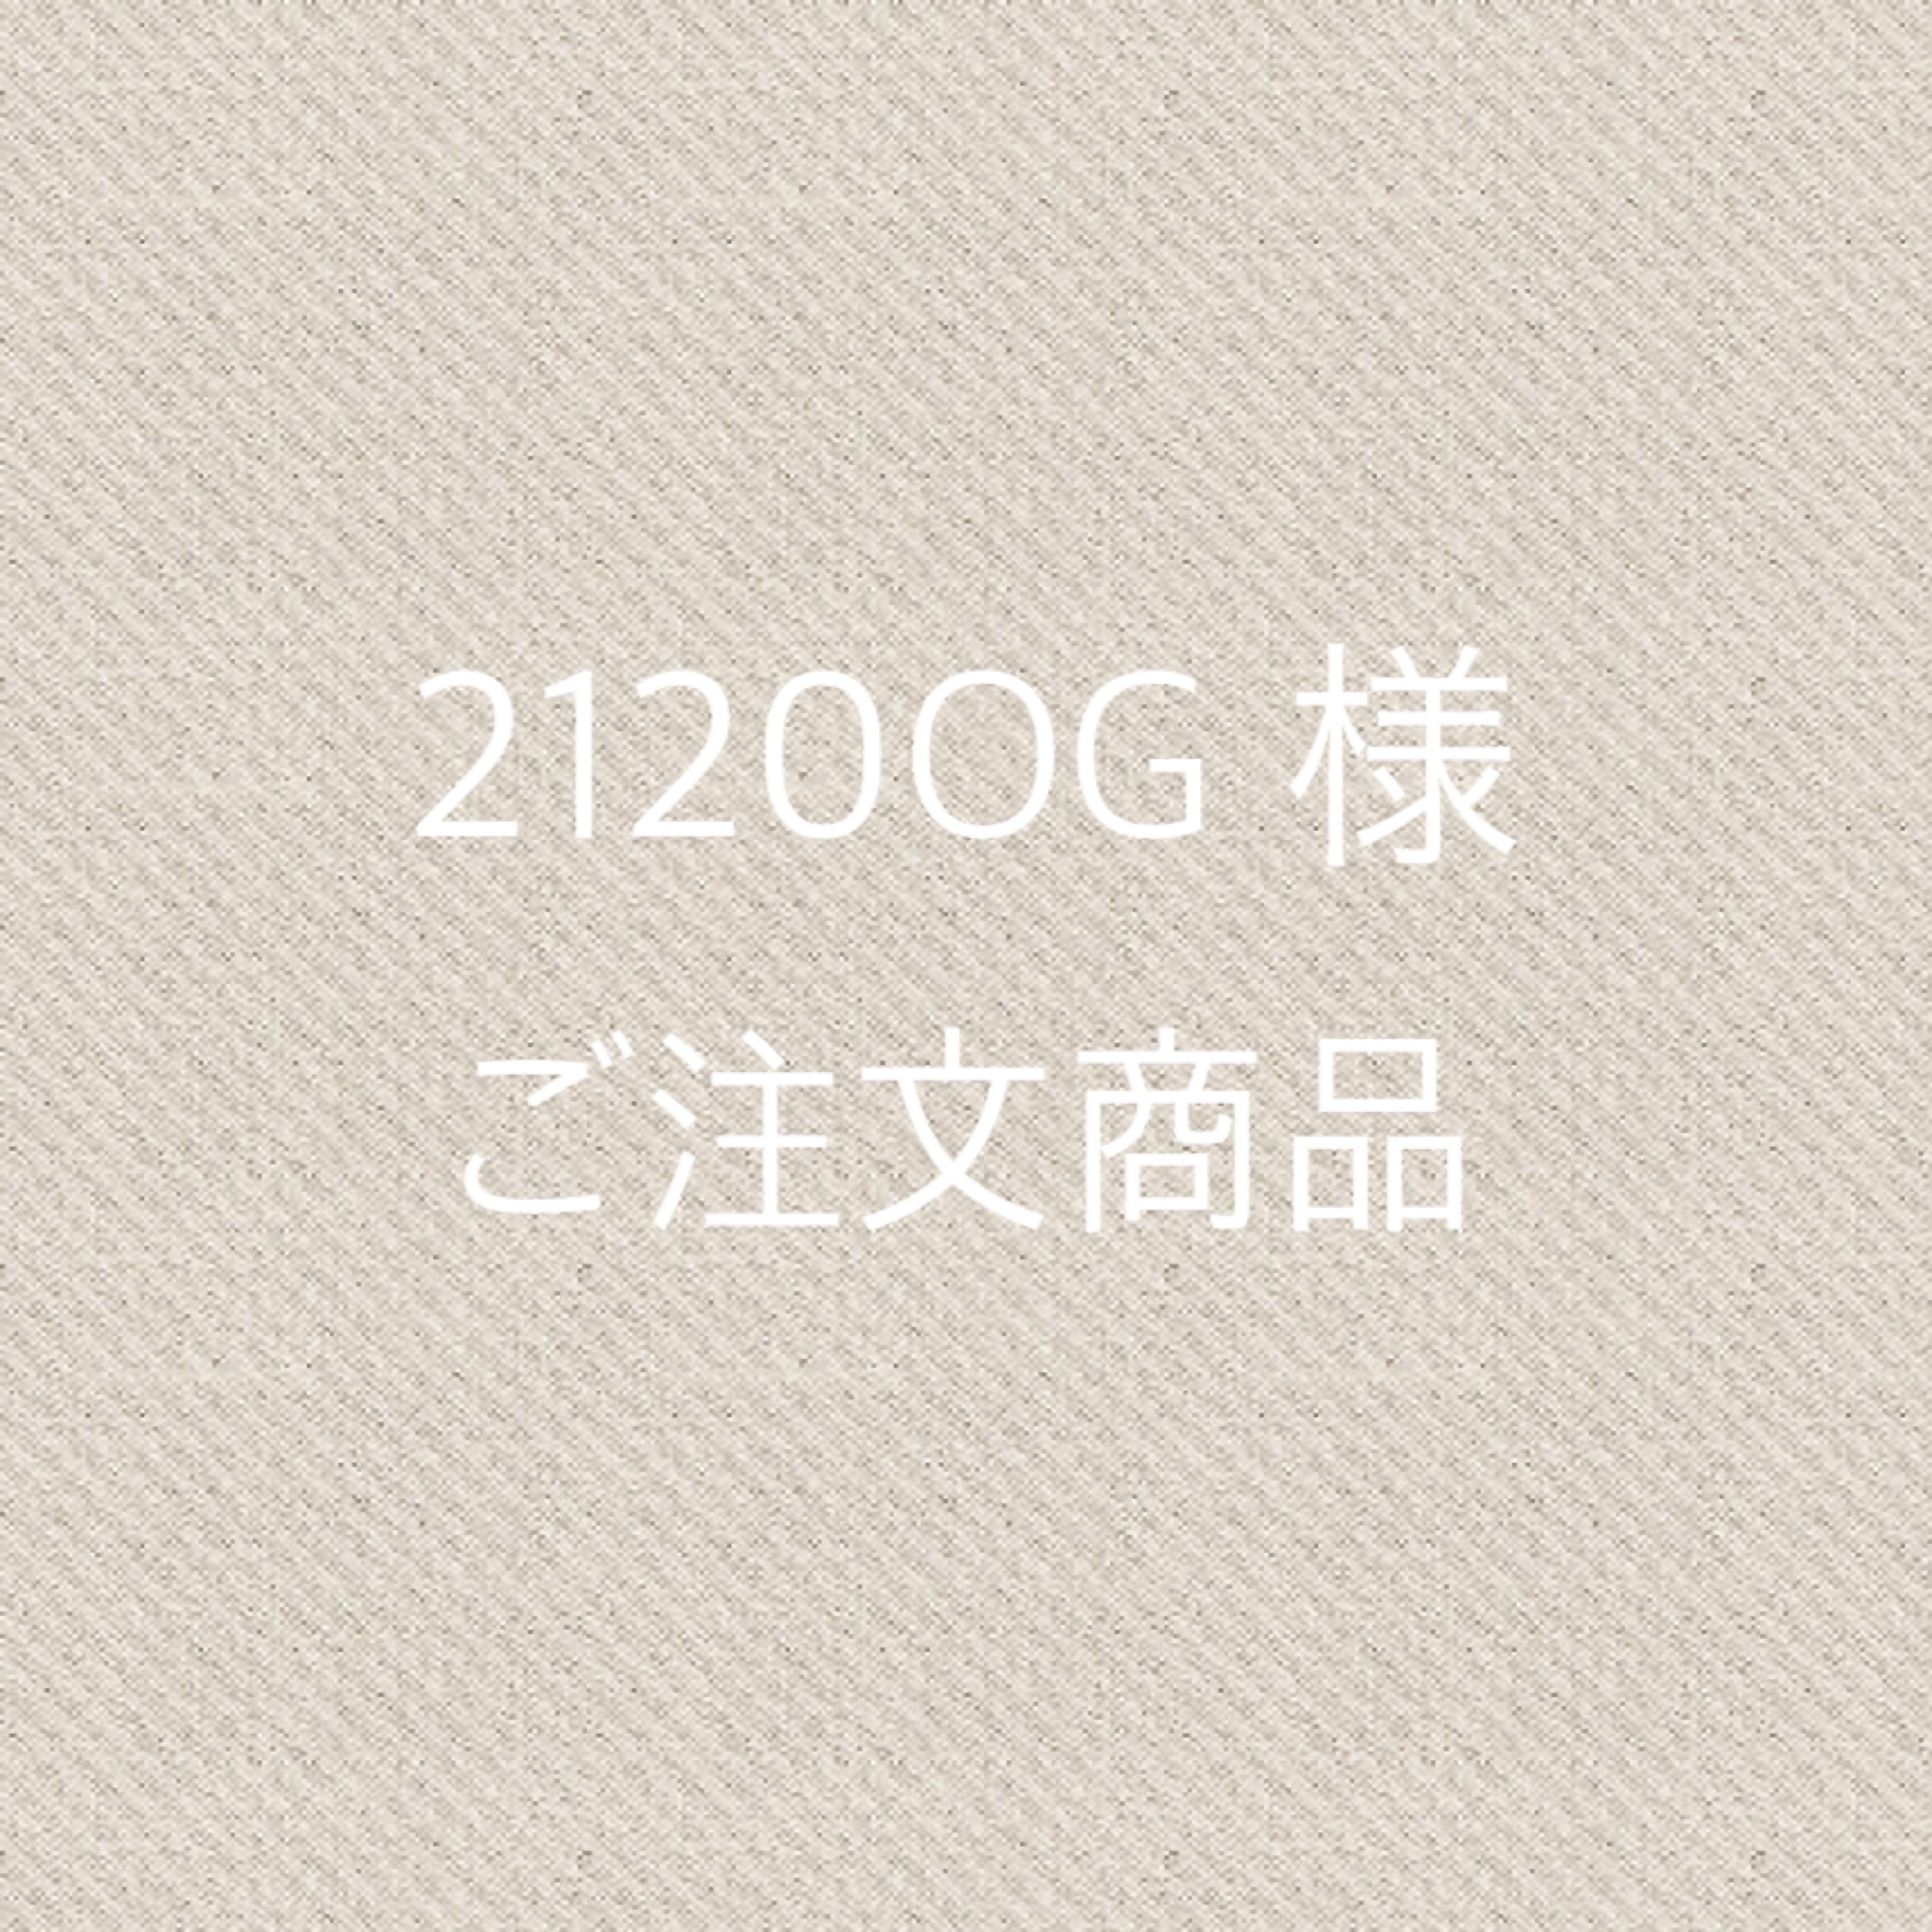 [ 2120OG 様 ] ご注文の商品となります。